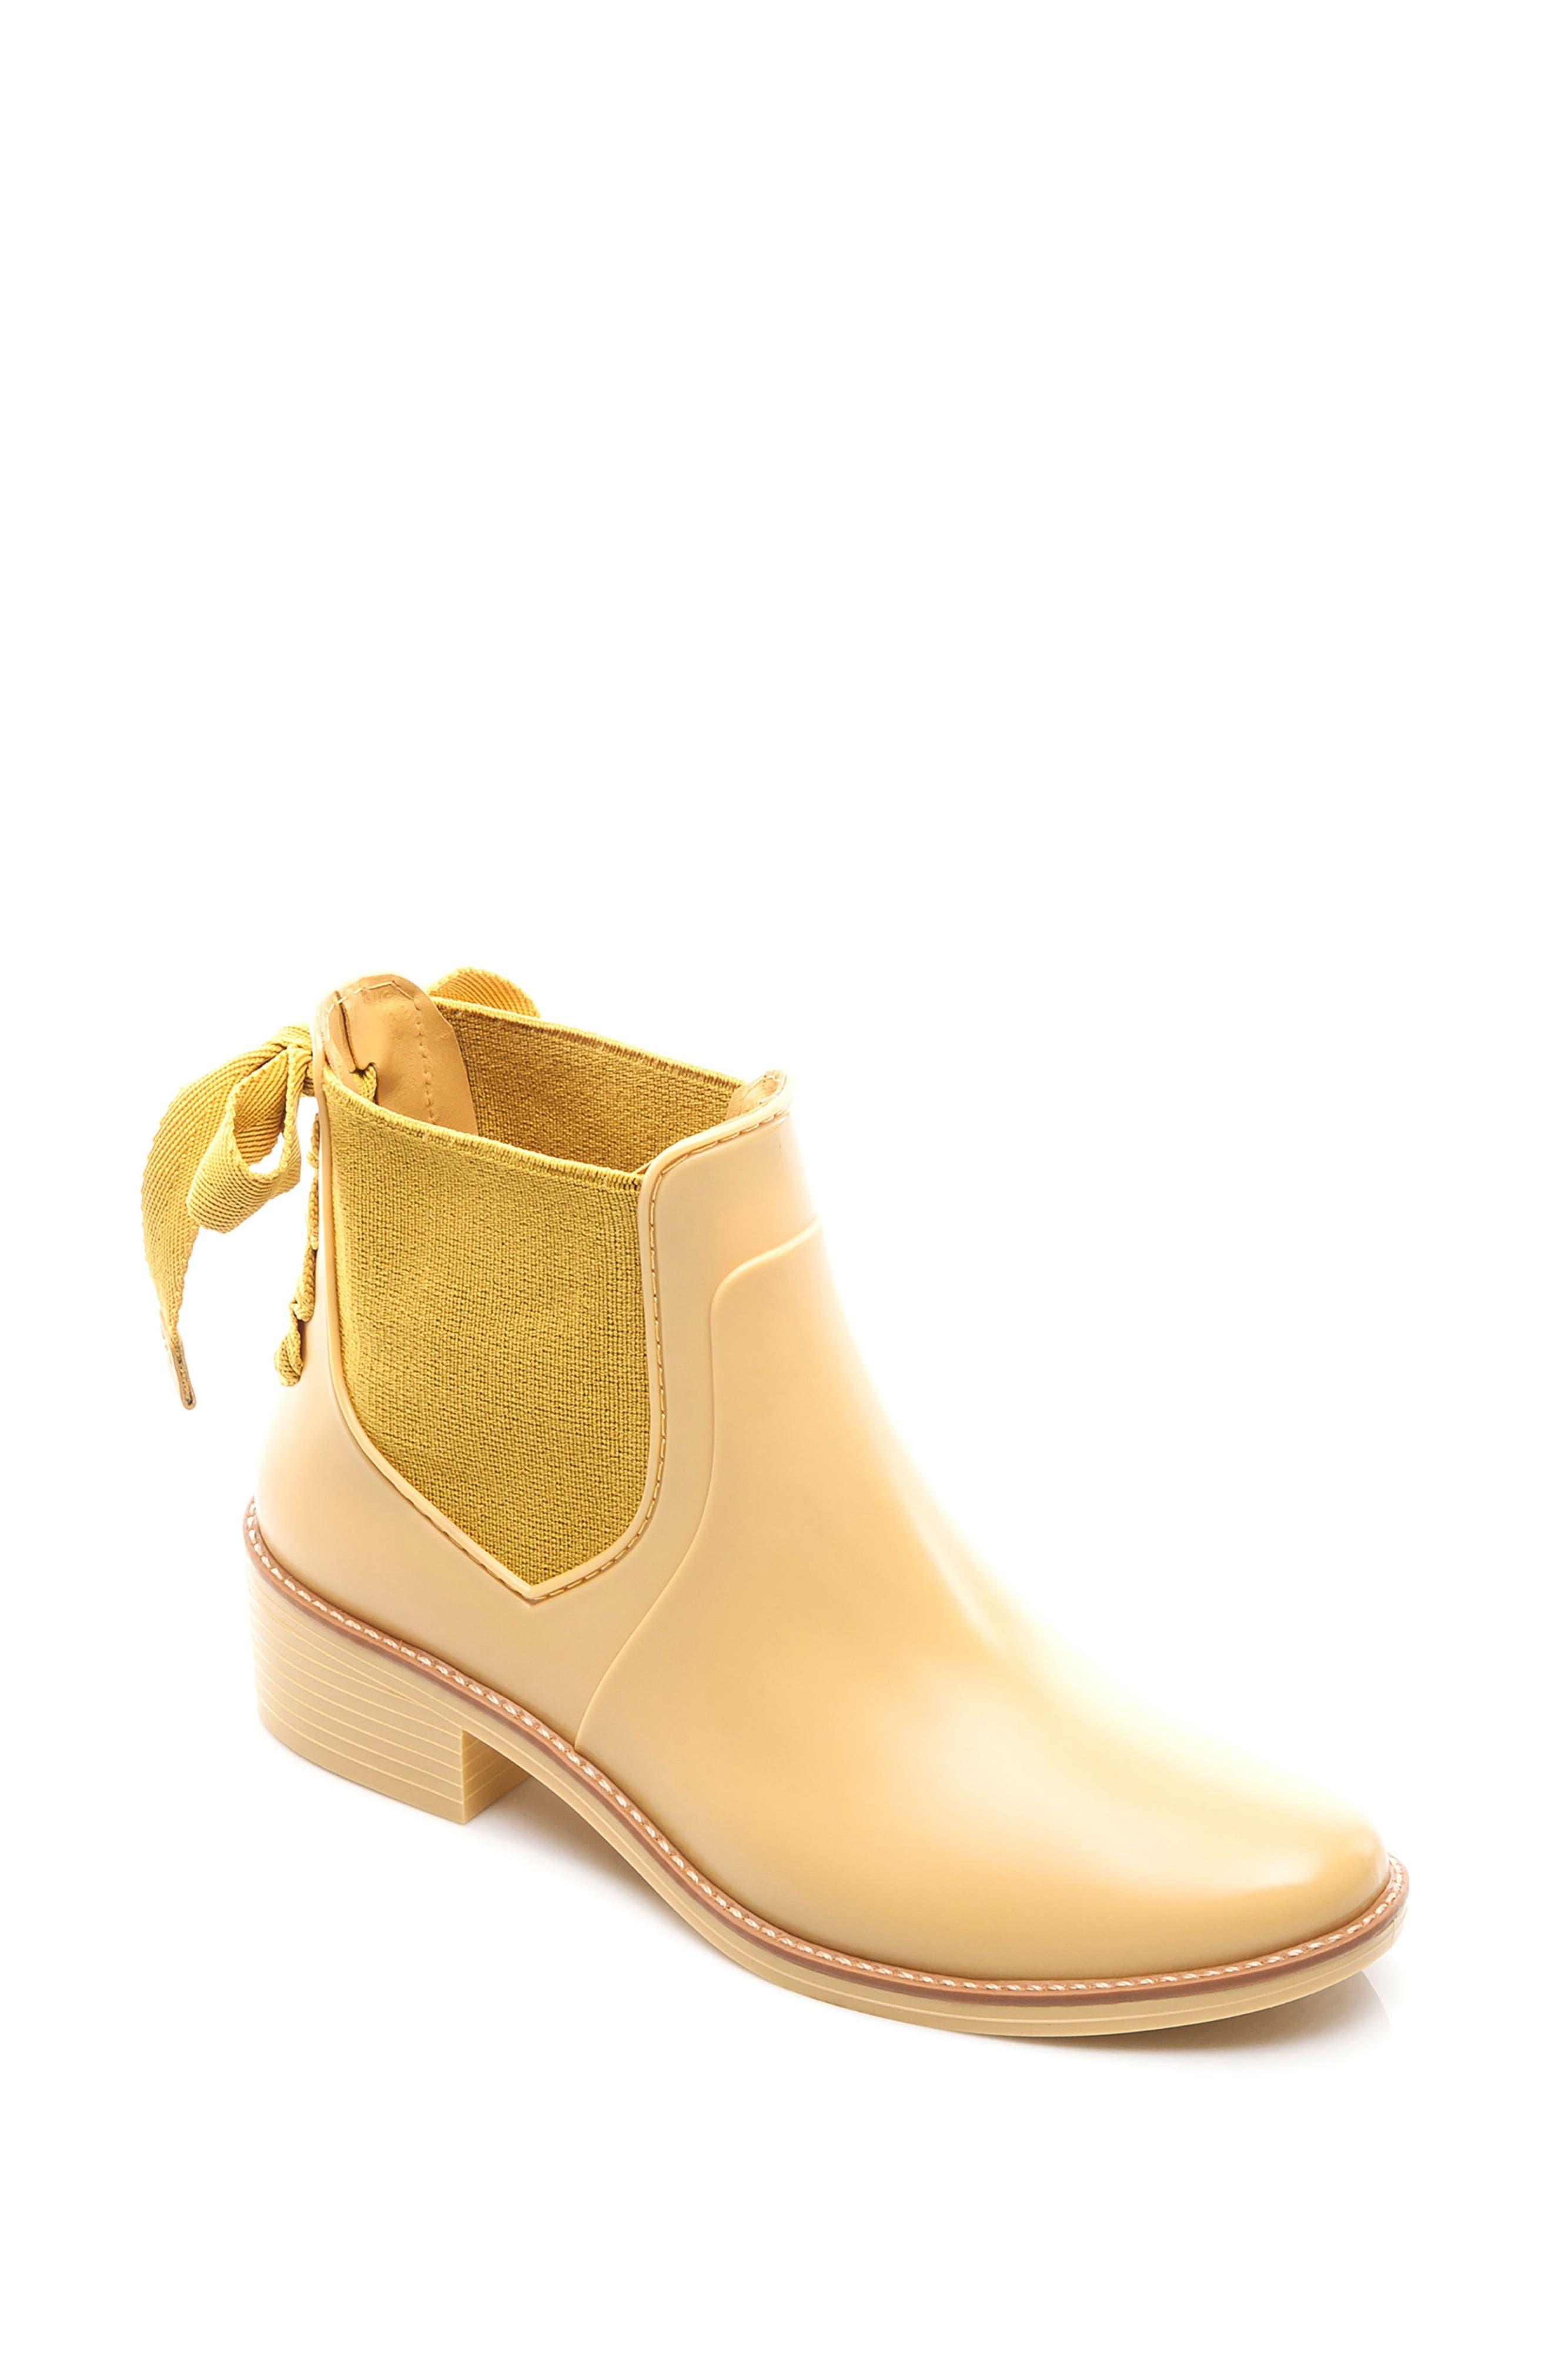 Paige Rain Boot,                             Main thumbnail 1, color,                             Yellow